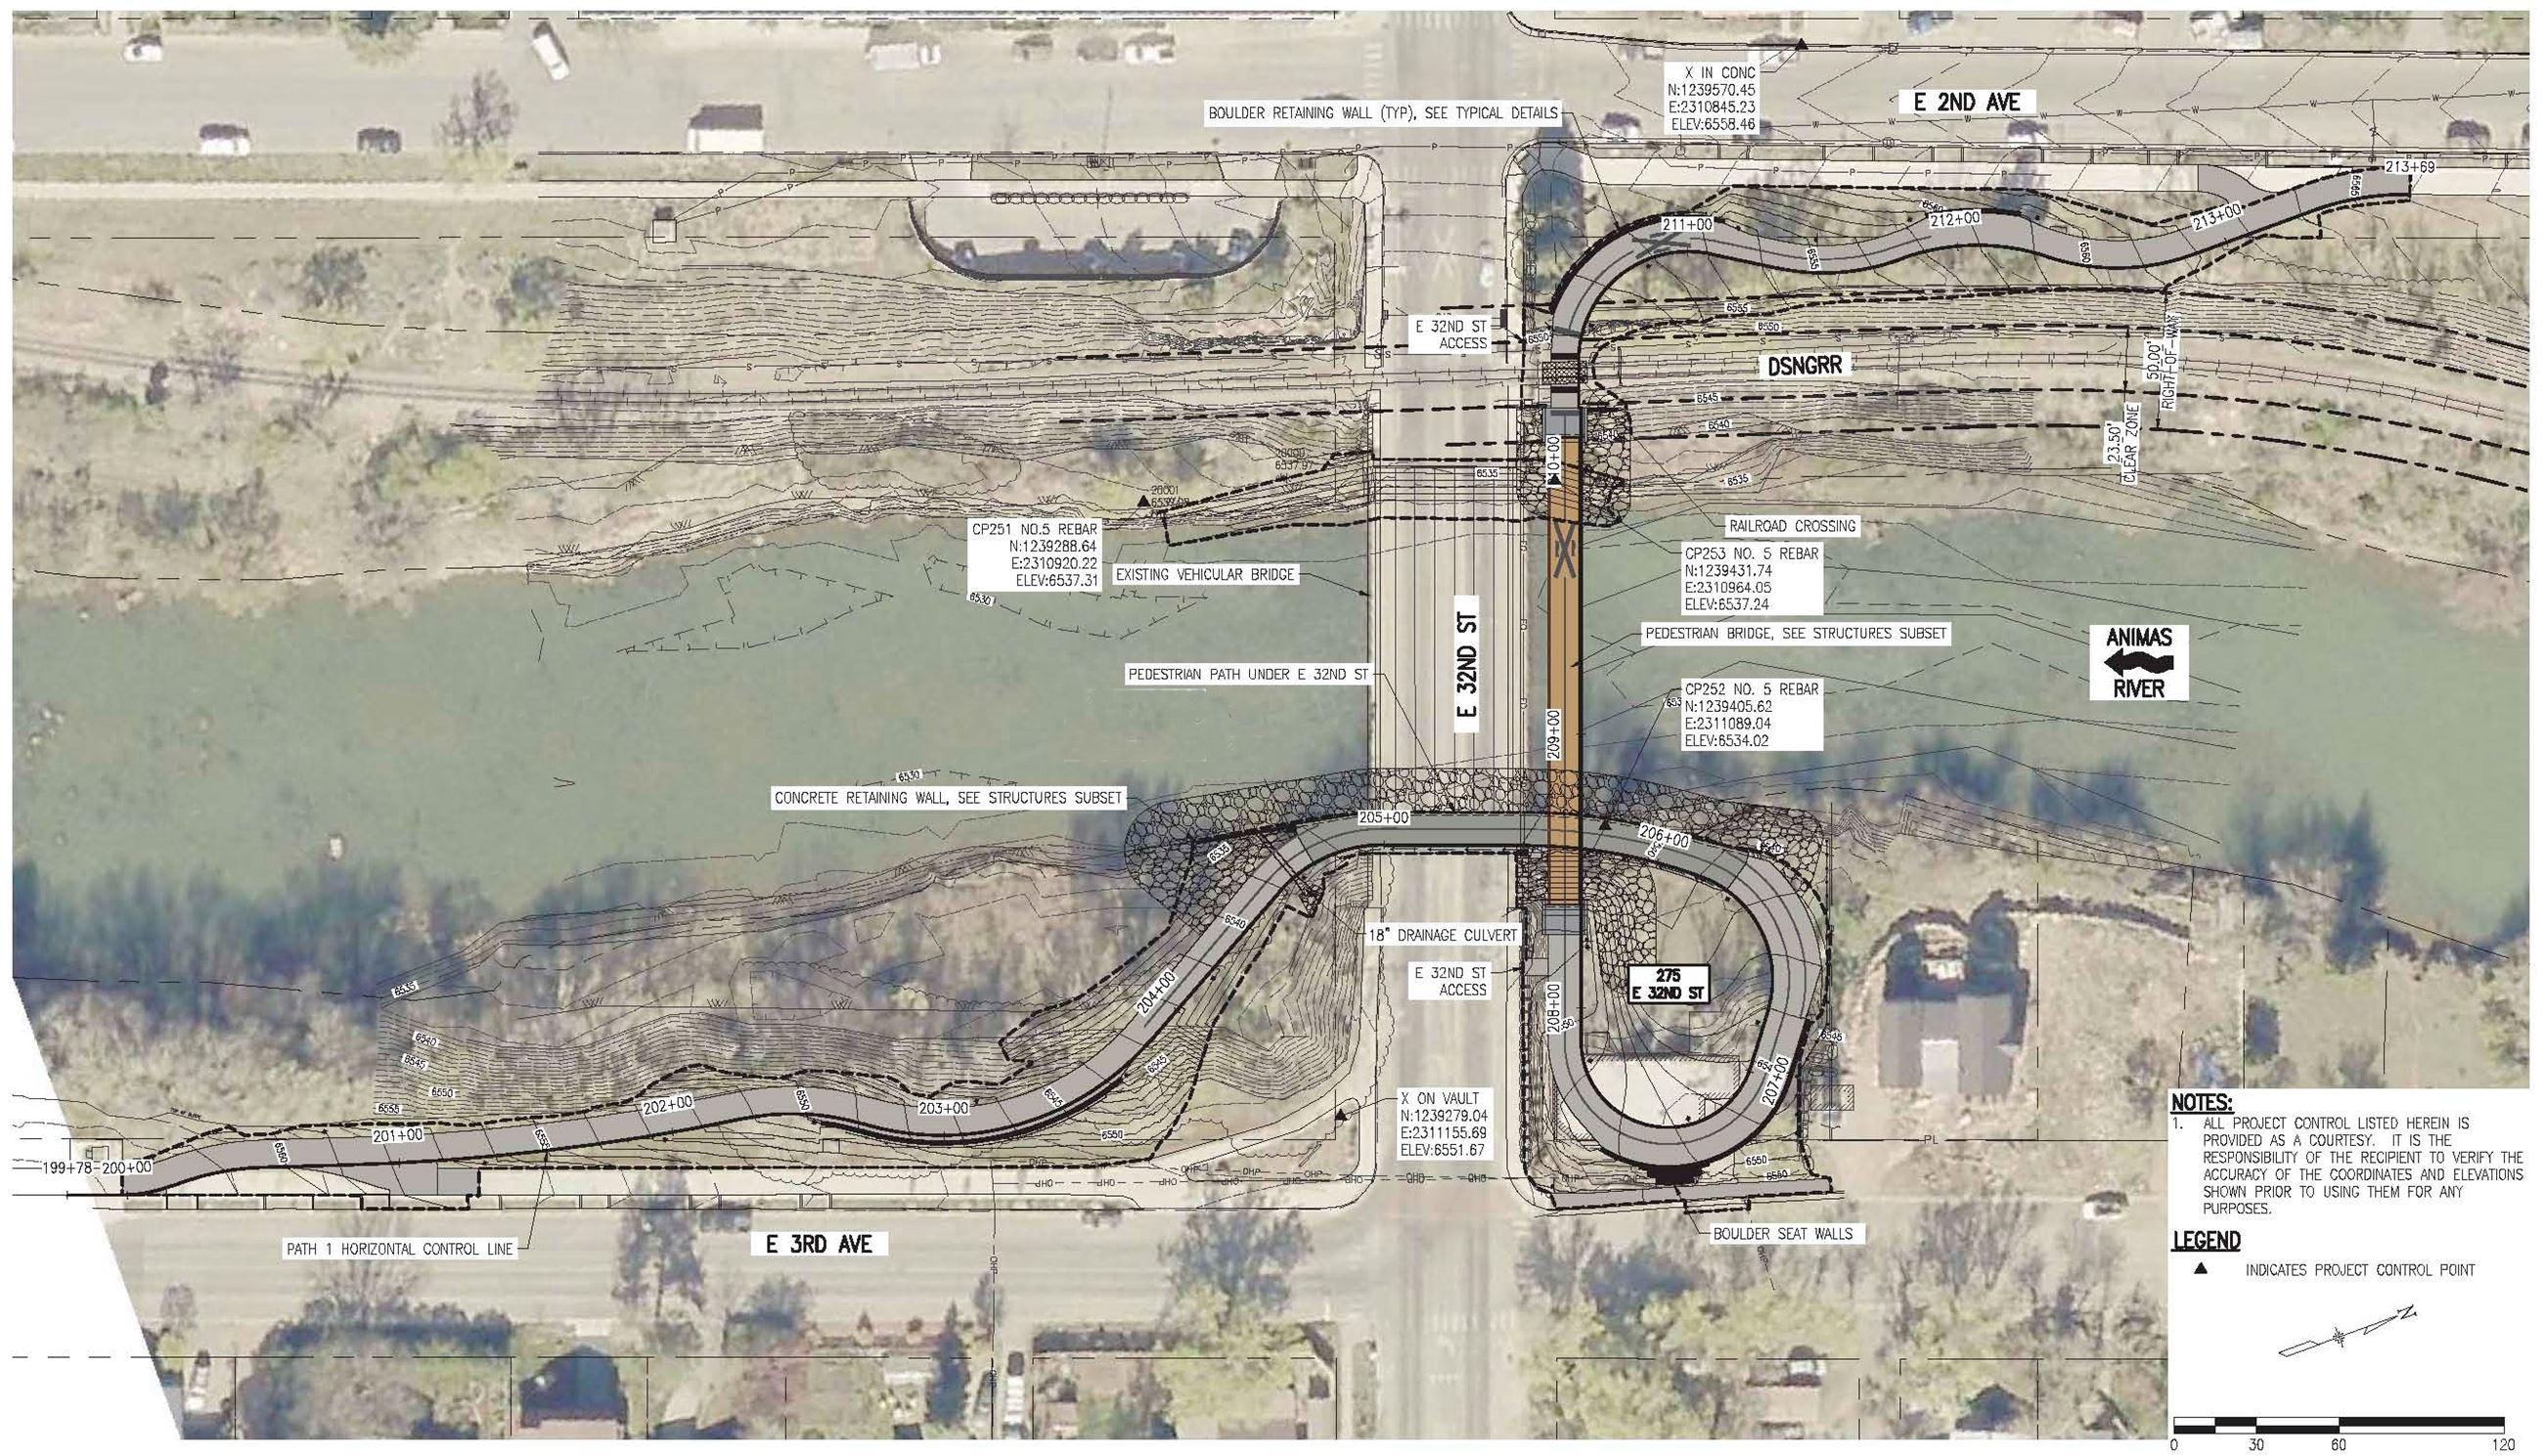 32nd St Crossing Site Plan 2021 Opens in new window